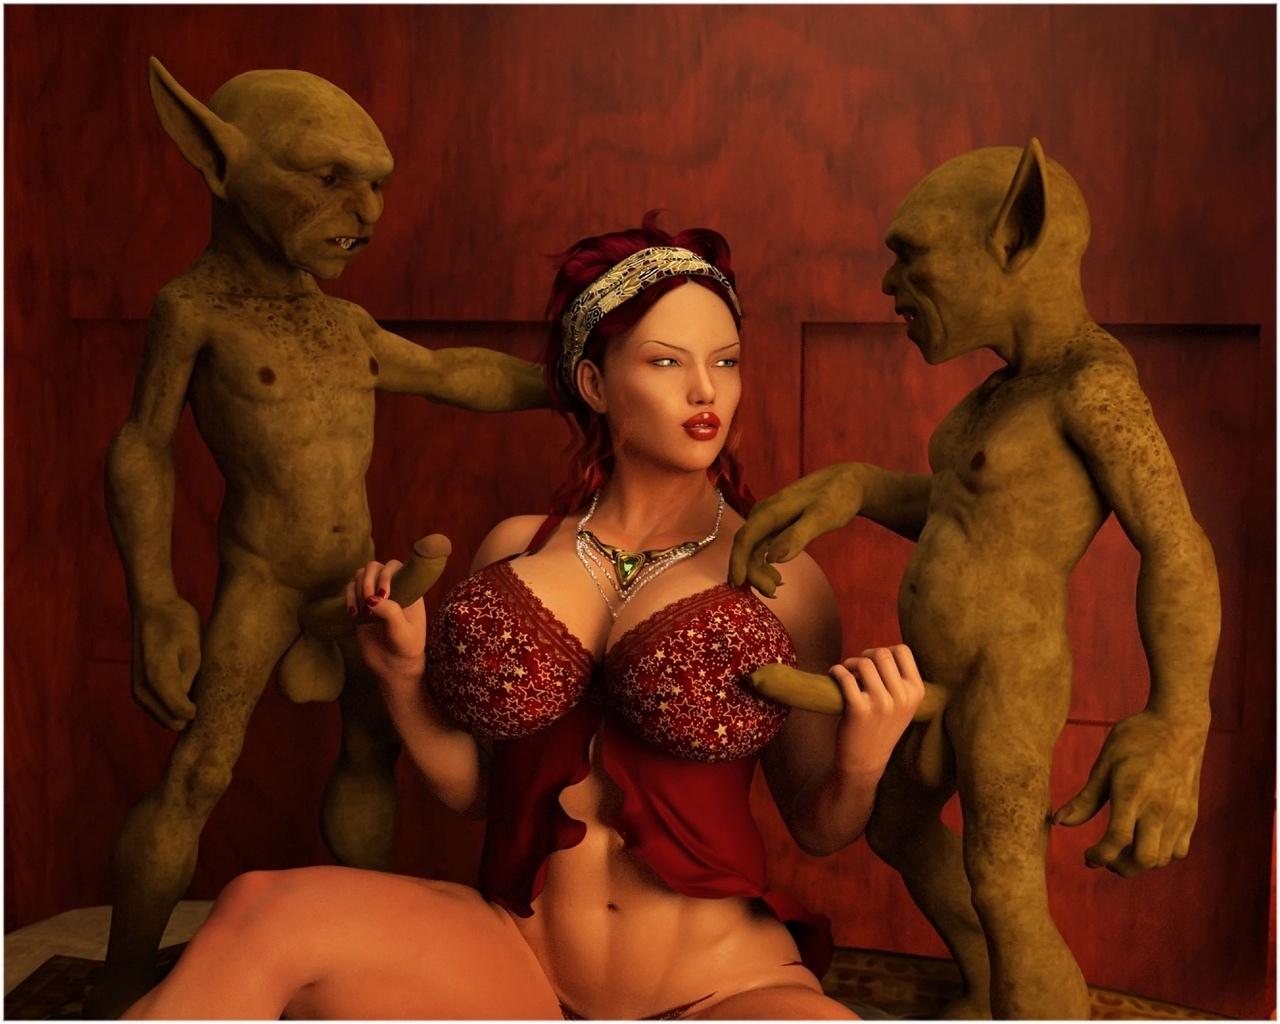 Captain Maia & The Goblin Treasure - part 2